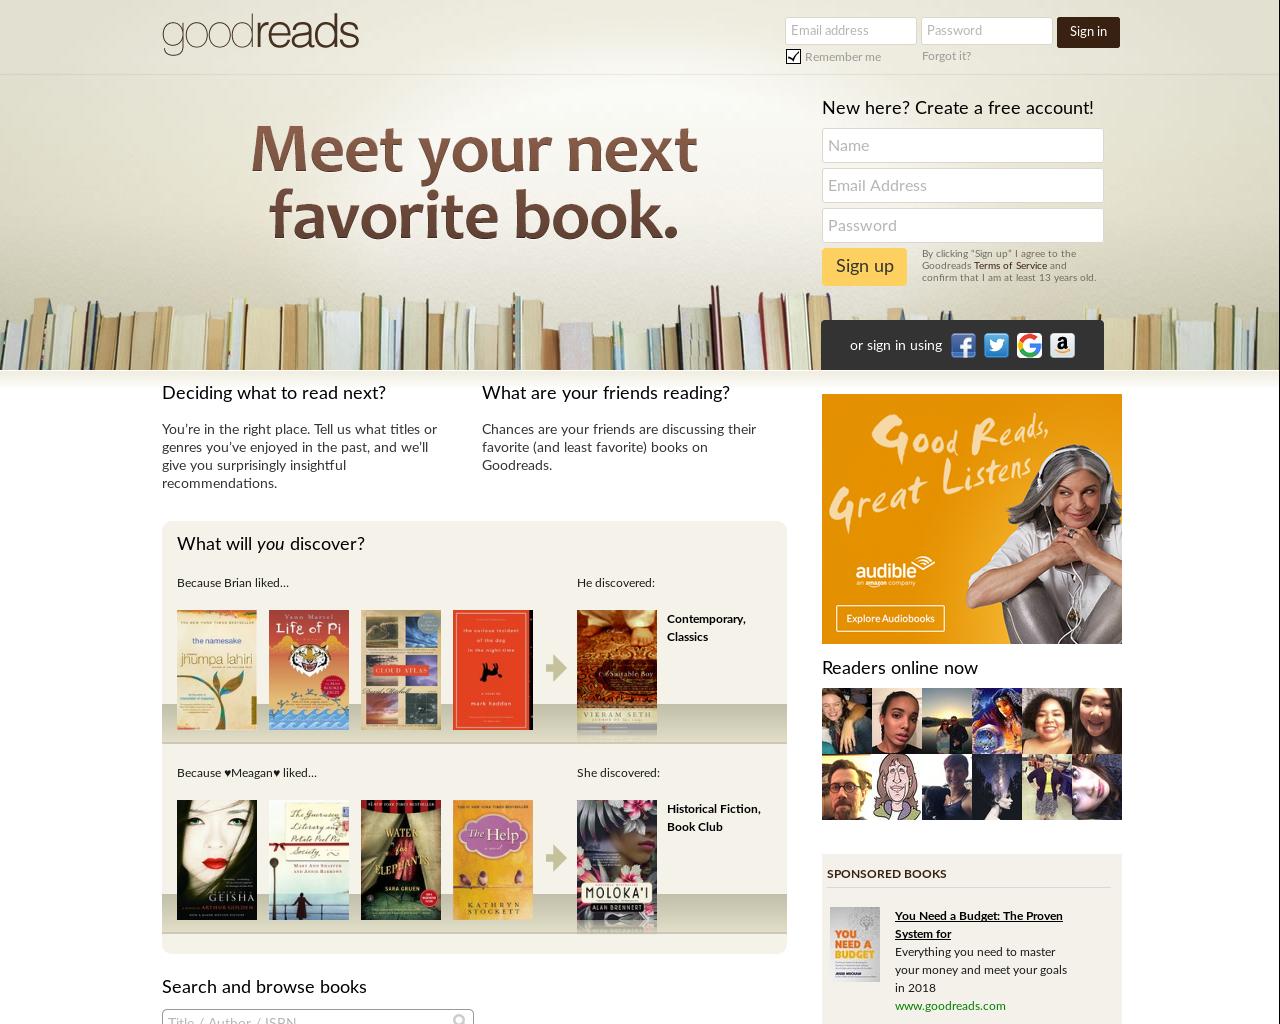 www.goodreads.com(2018/01/13 08:01:03)